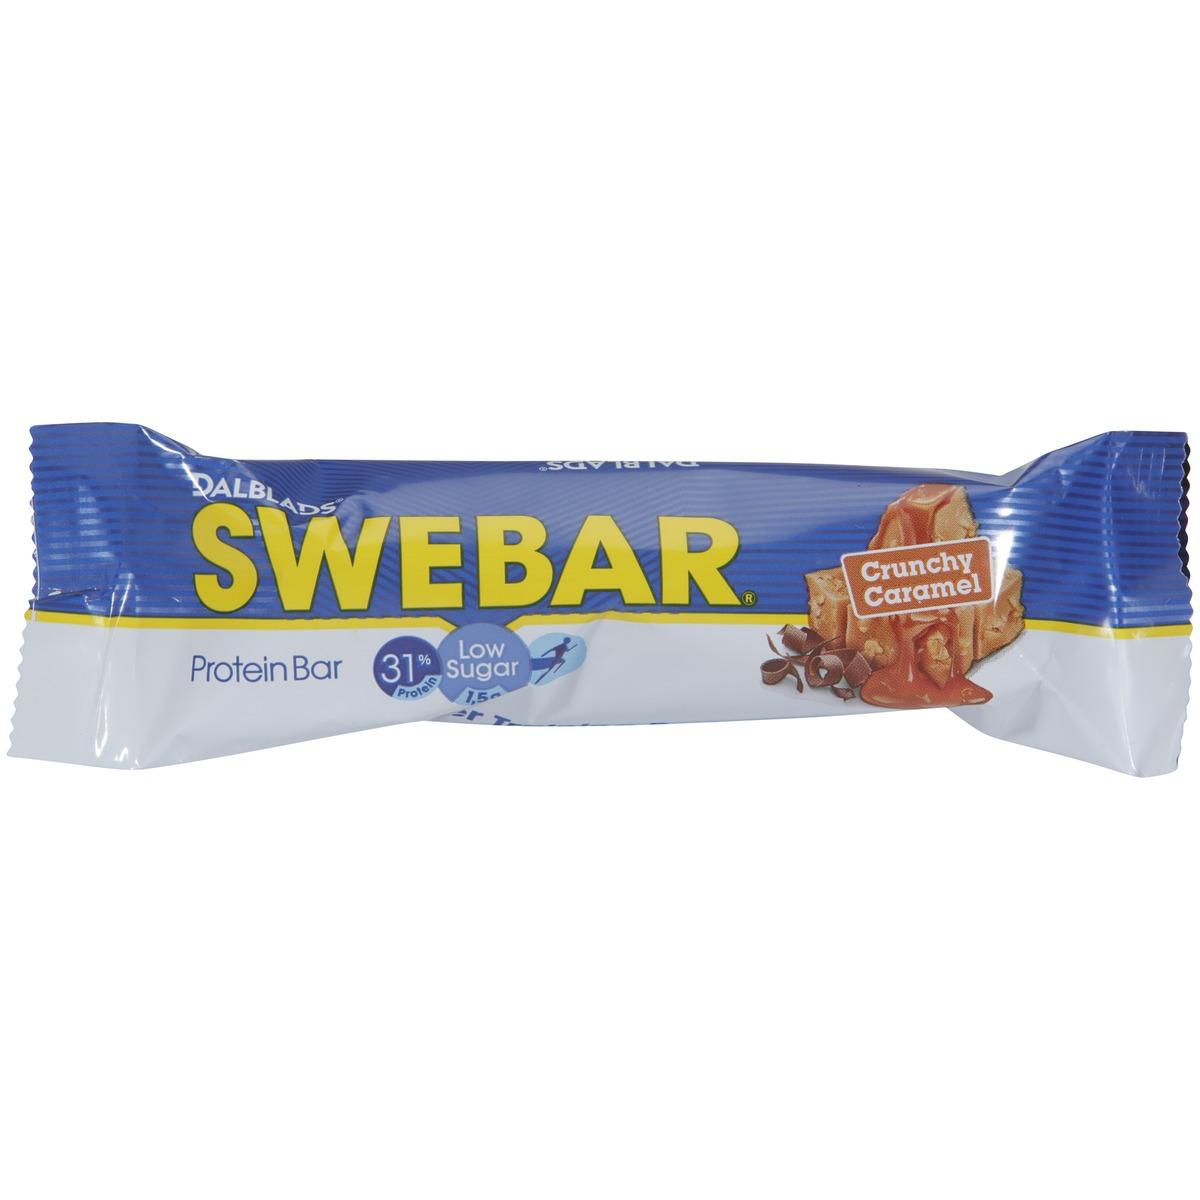 Swebar Low Sugar, proteinbar